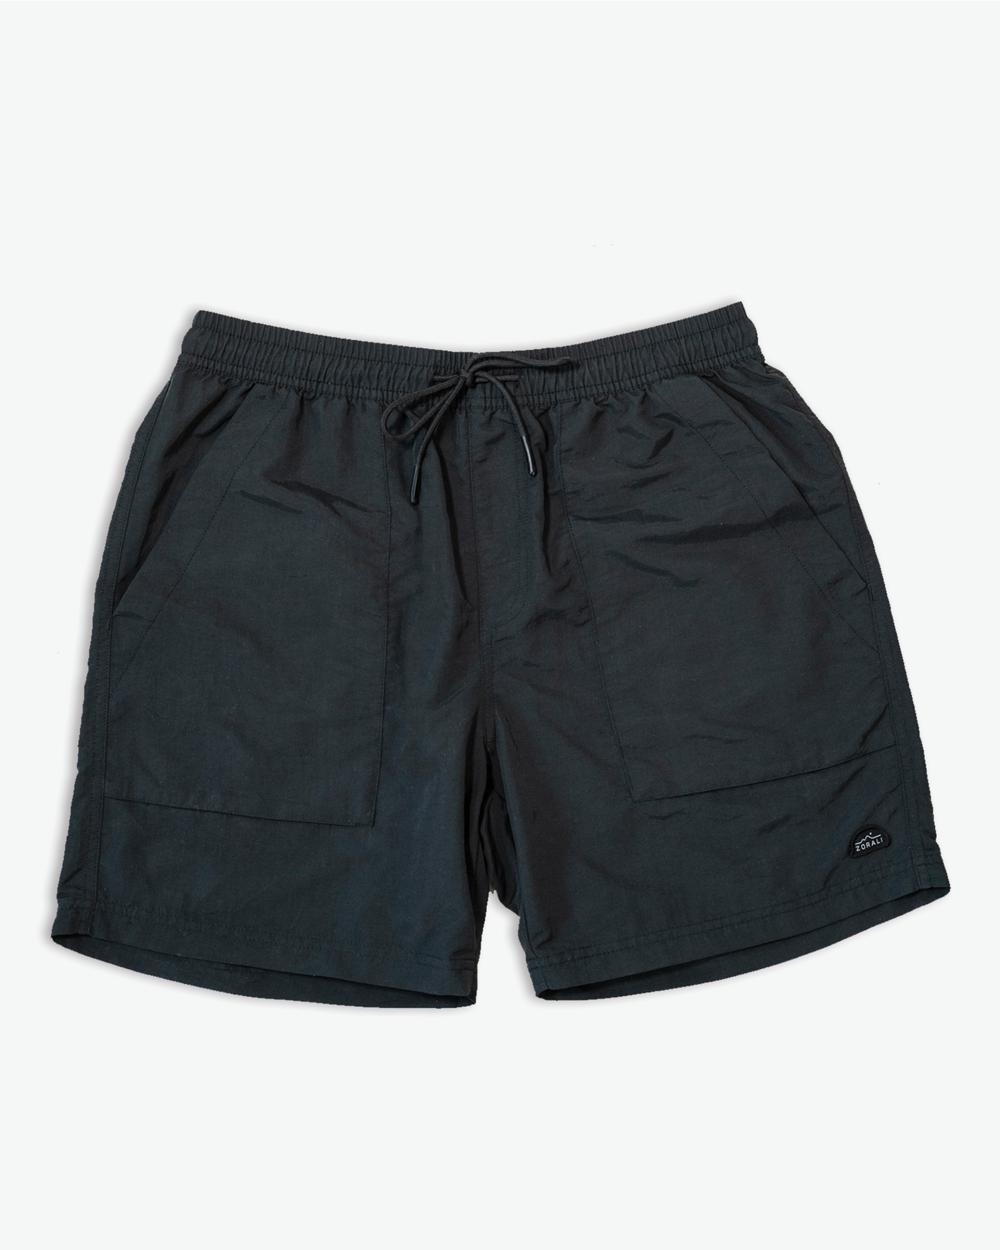 Zorali-Venture-Shorts-Black.png